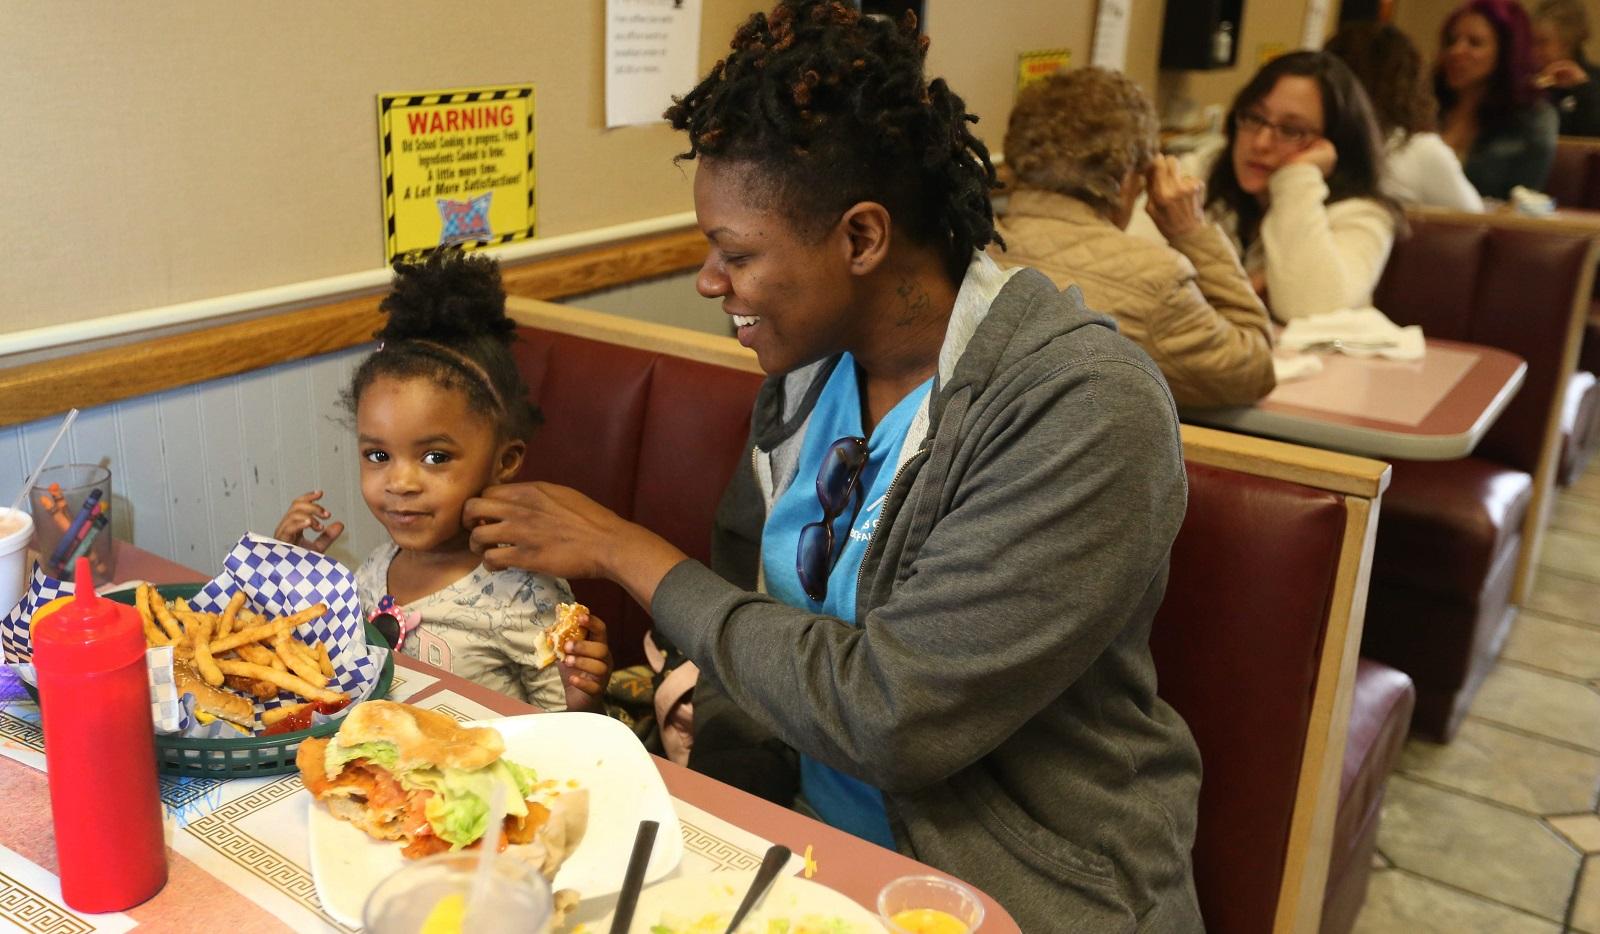 Tiffani Wofford, of Buffalo, eats lunch at Greek to Me with her daughter Song Alexander, 2. (Sharon Cantillon/Buffalo News)